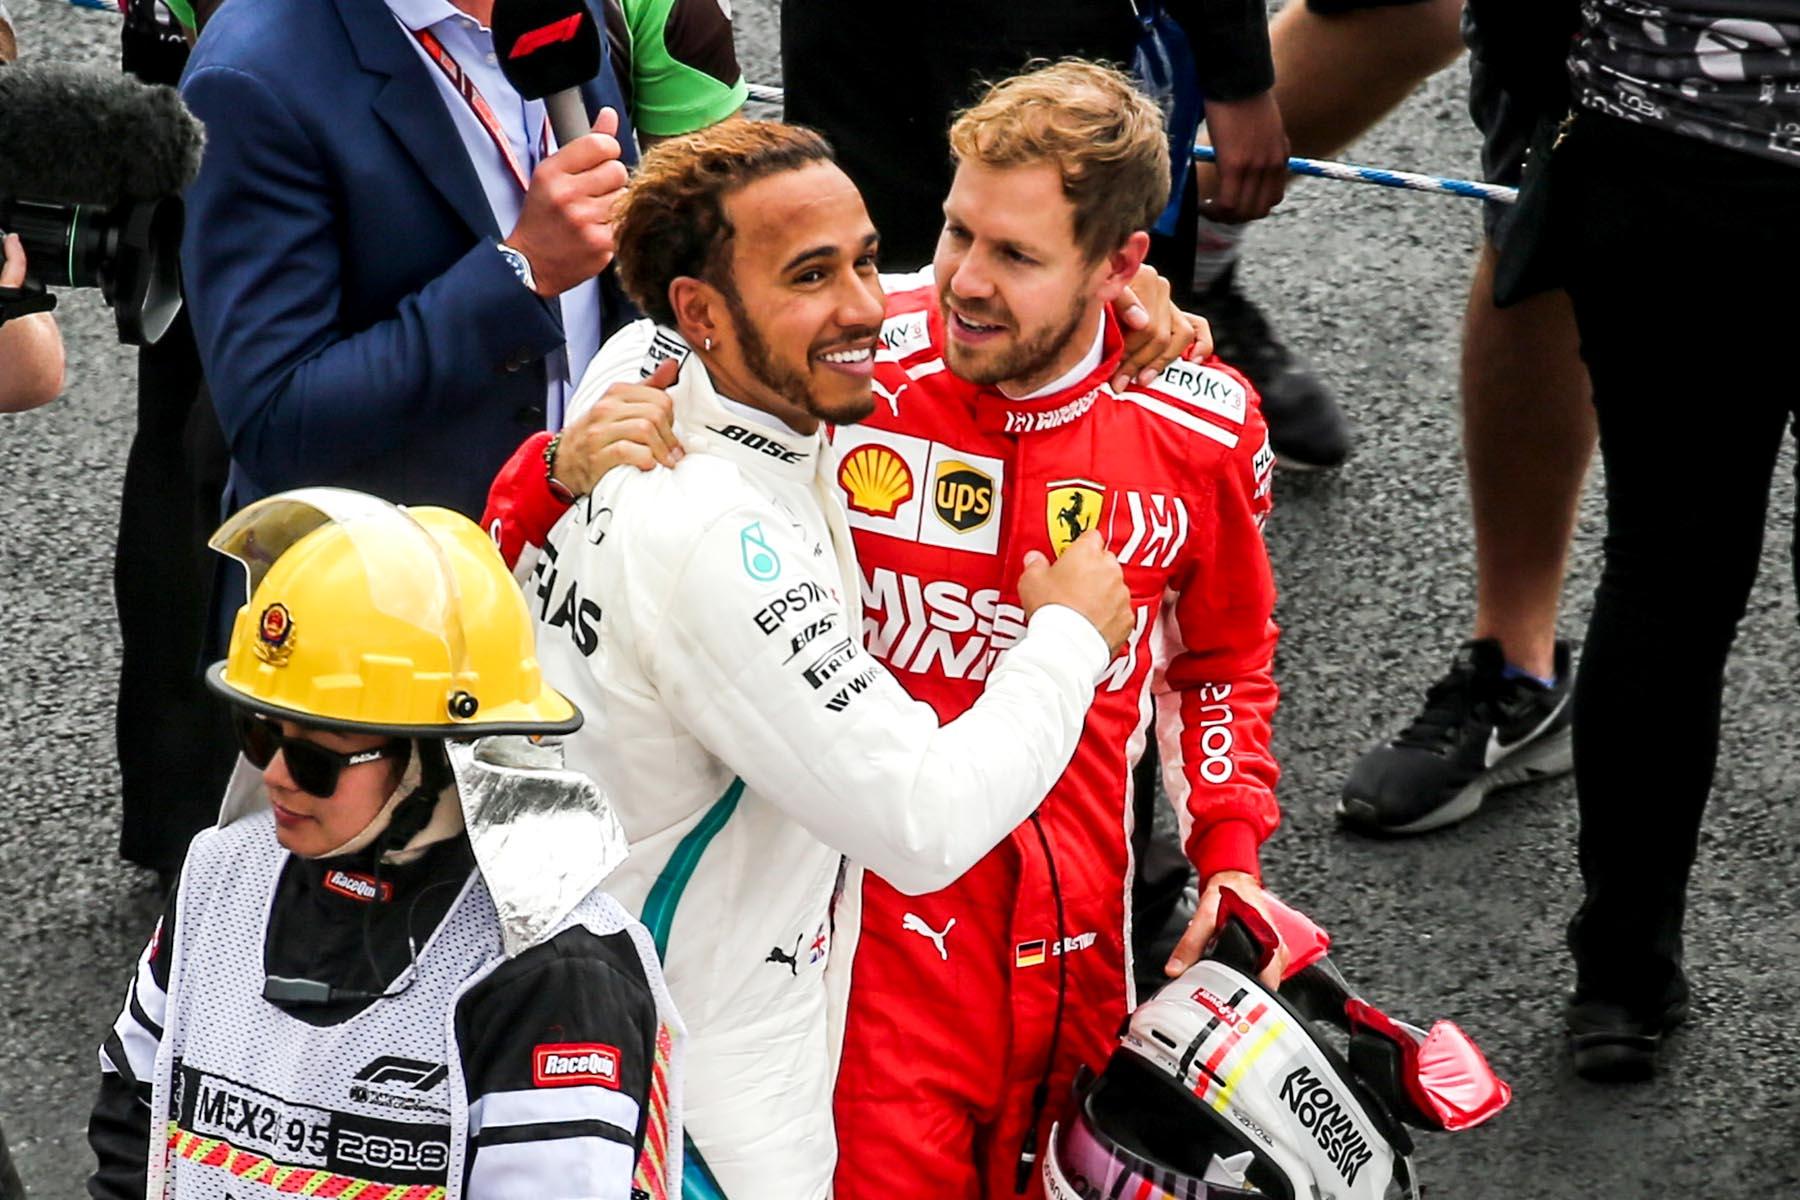 Sebastian Vettel congratulates Lewis Hamilton after the 2018 Mexican Grand Prix.